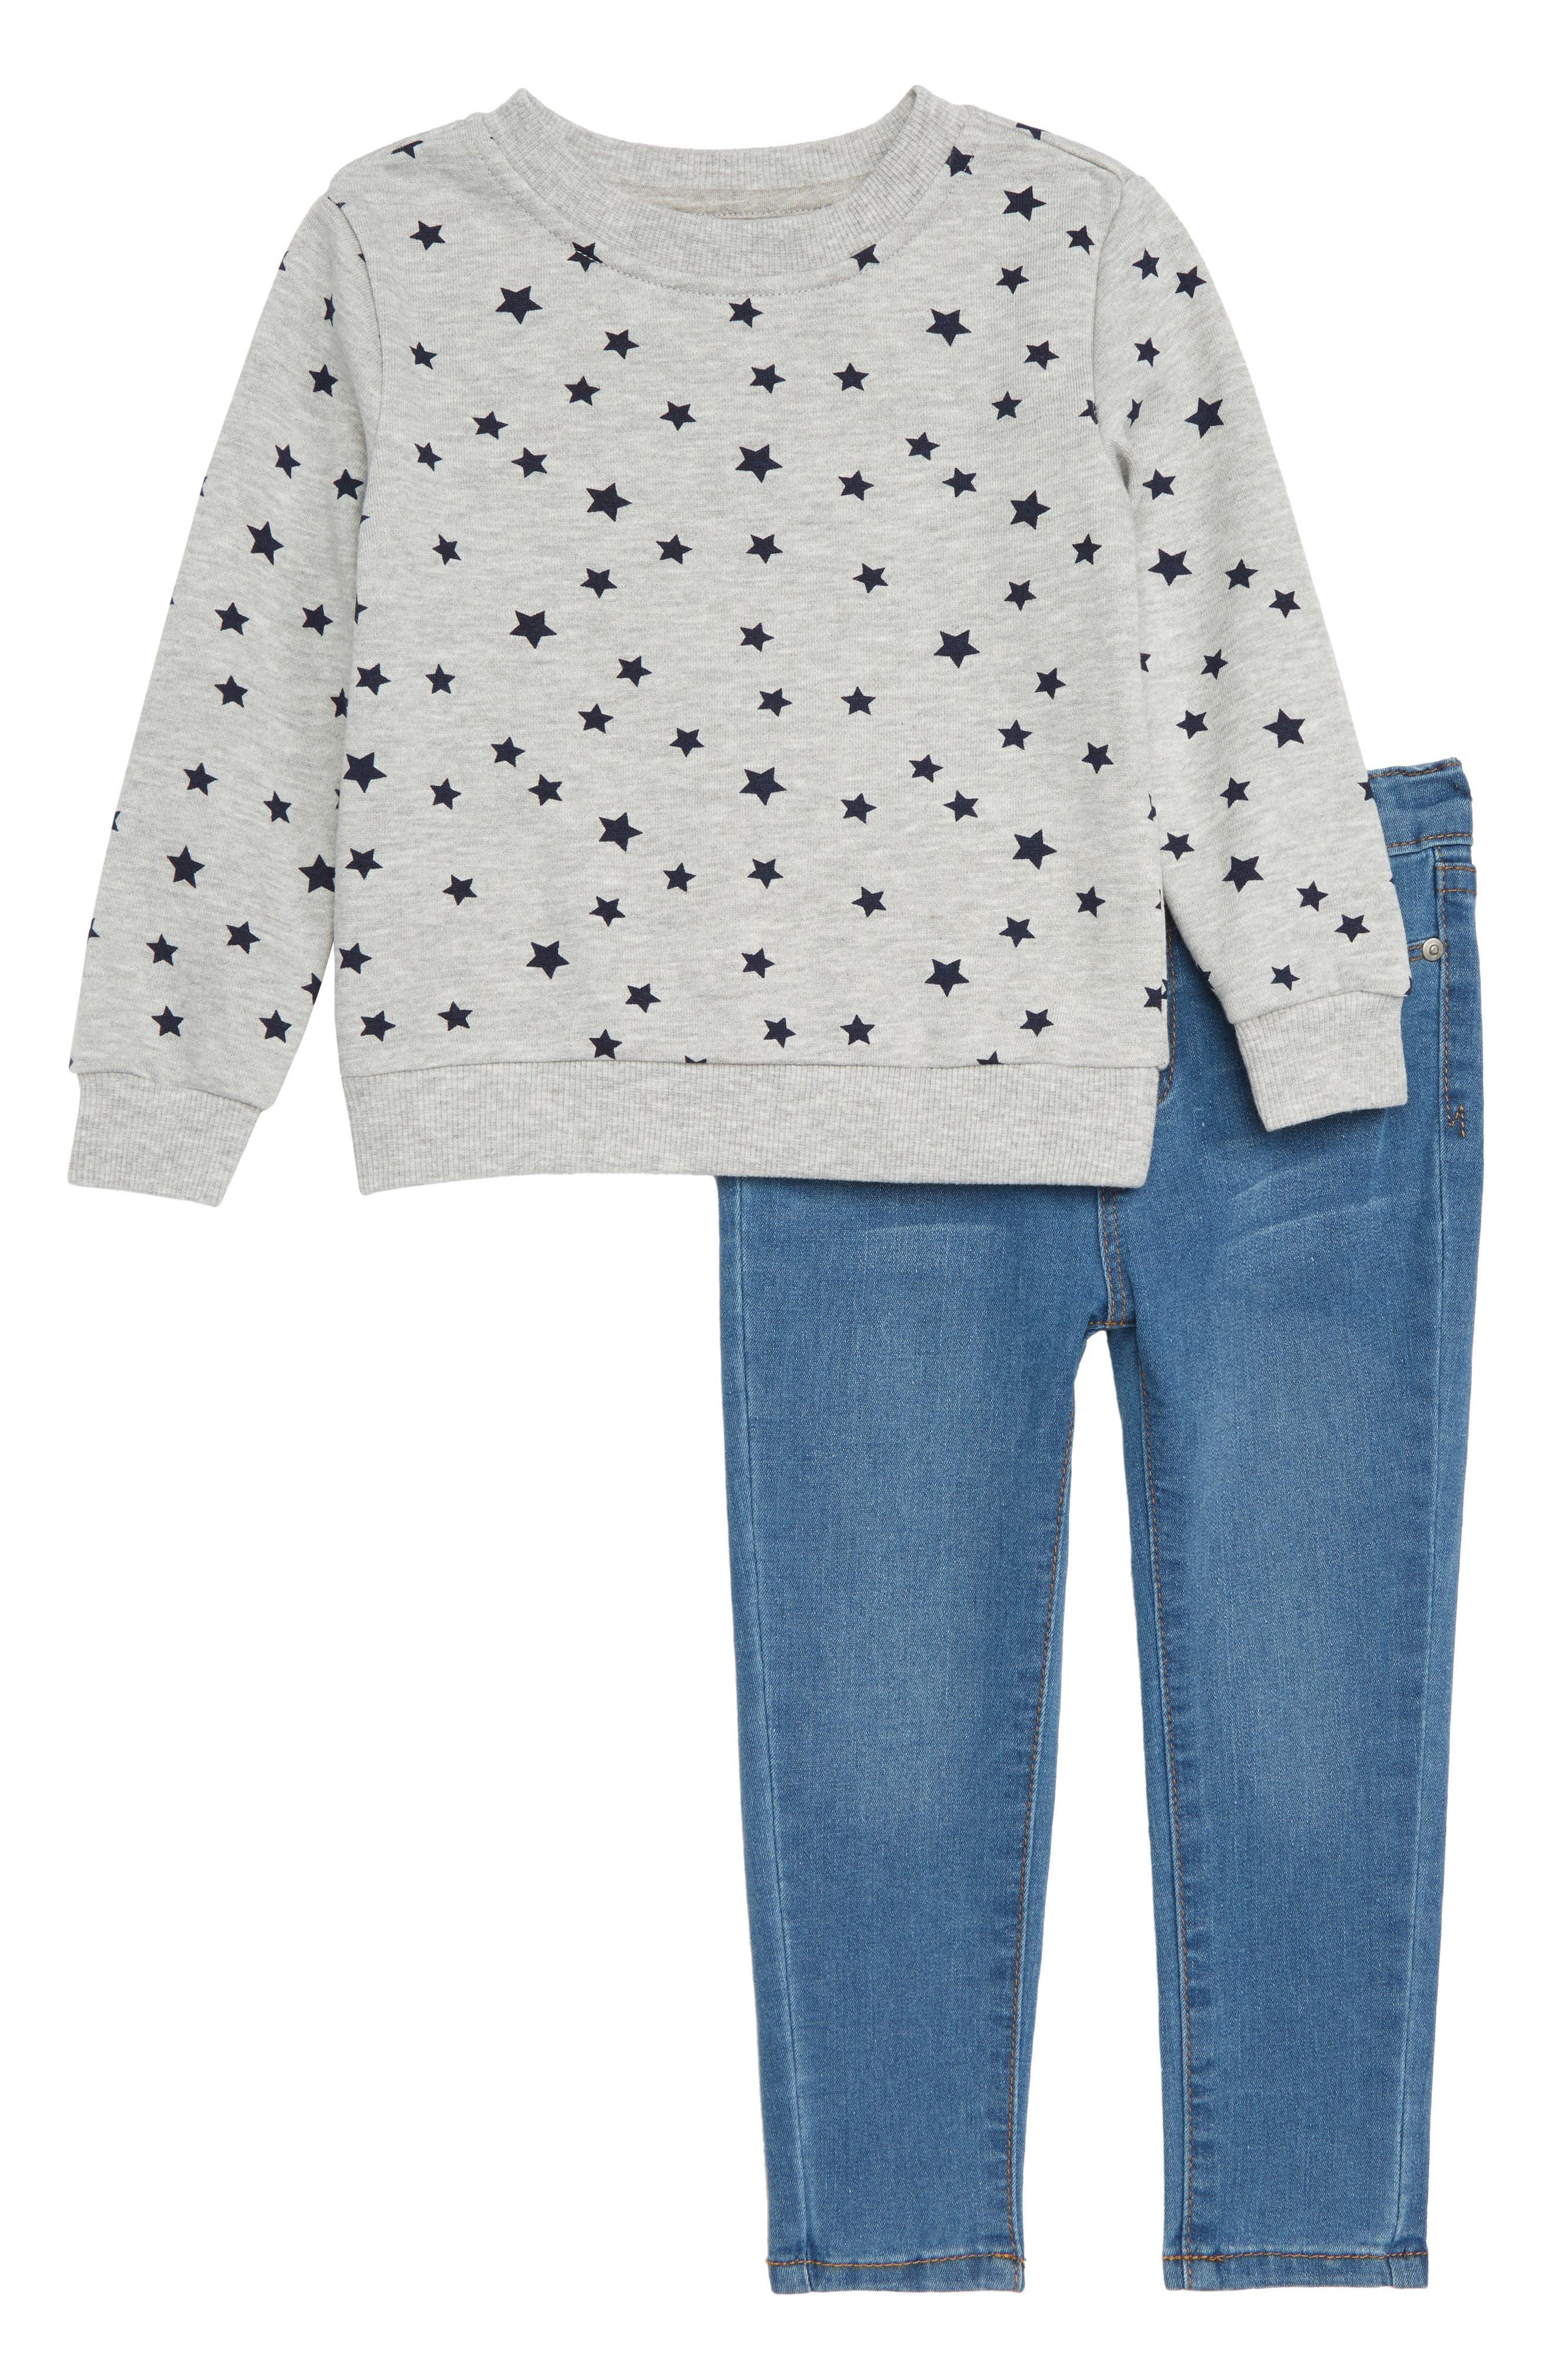 Toddler Girls Ag Adriano Goldschmied Kids Sweatshirt  Jeans Set